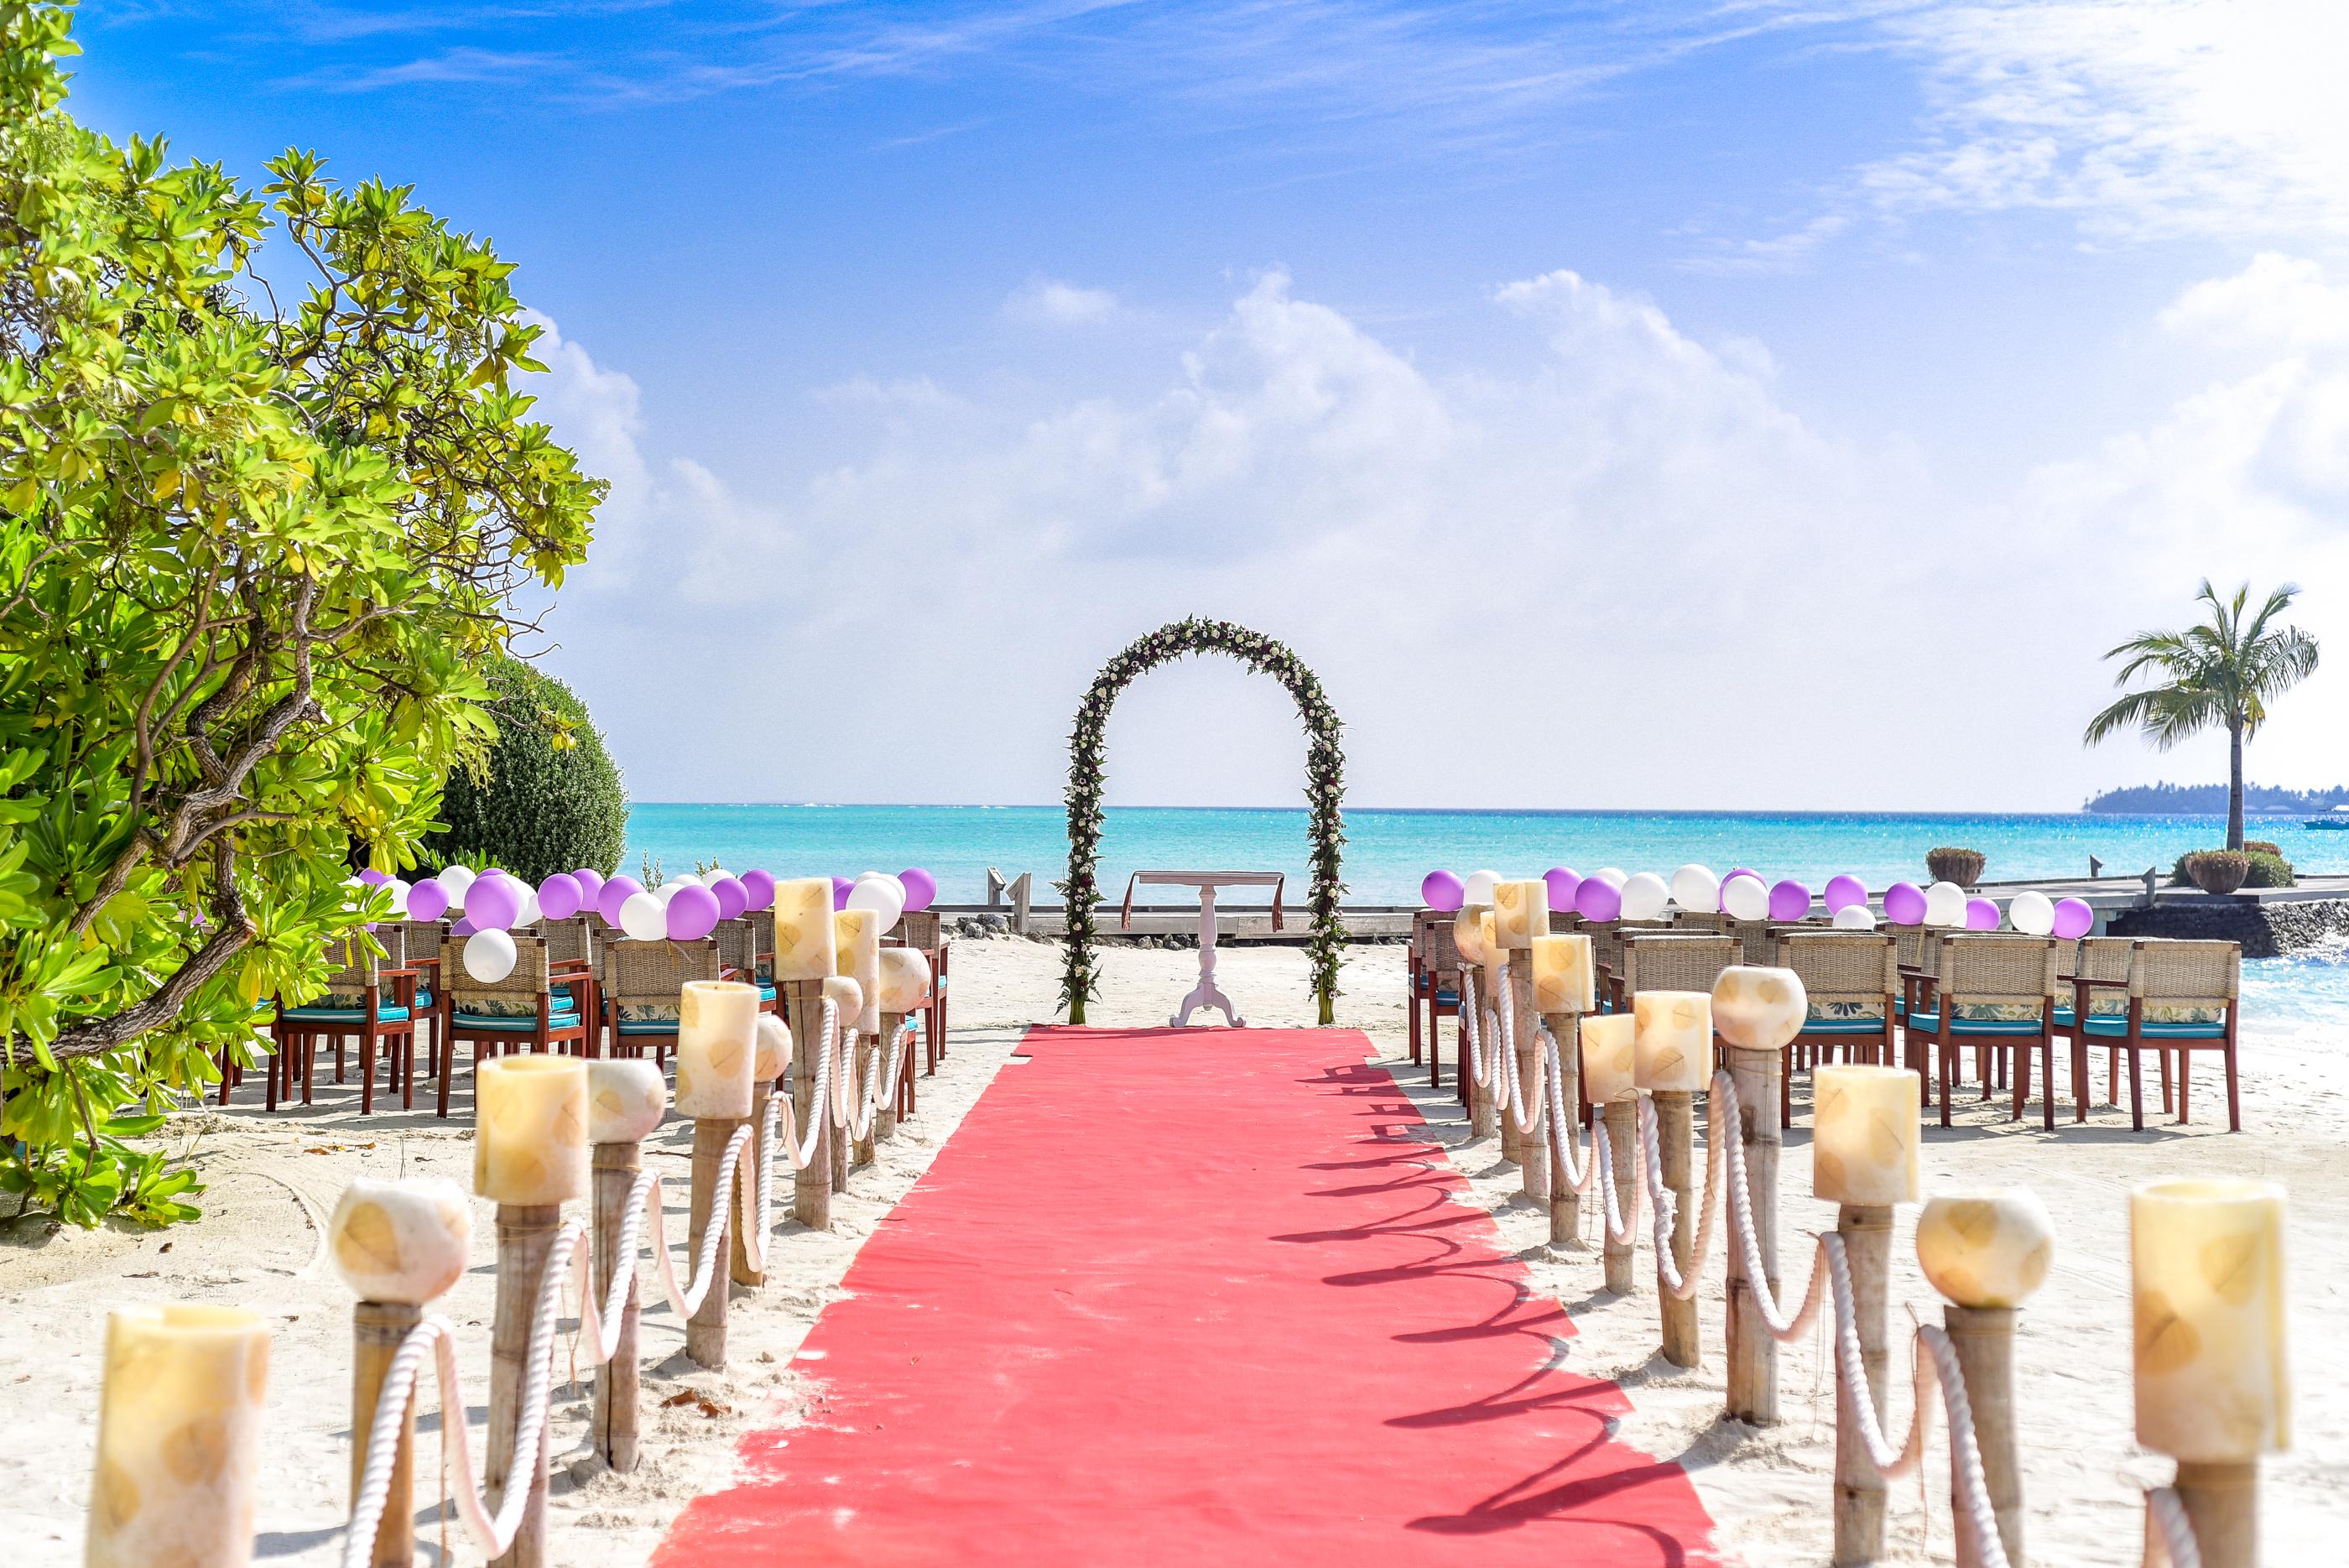 Seas Trees Chairs Luxury Resort Balloons Lanterns Estate Decorations Destination Beach Wedding Red Carpet Setup Arch